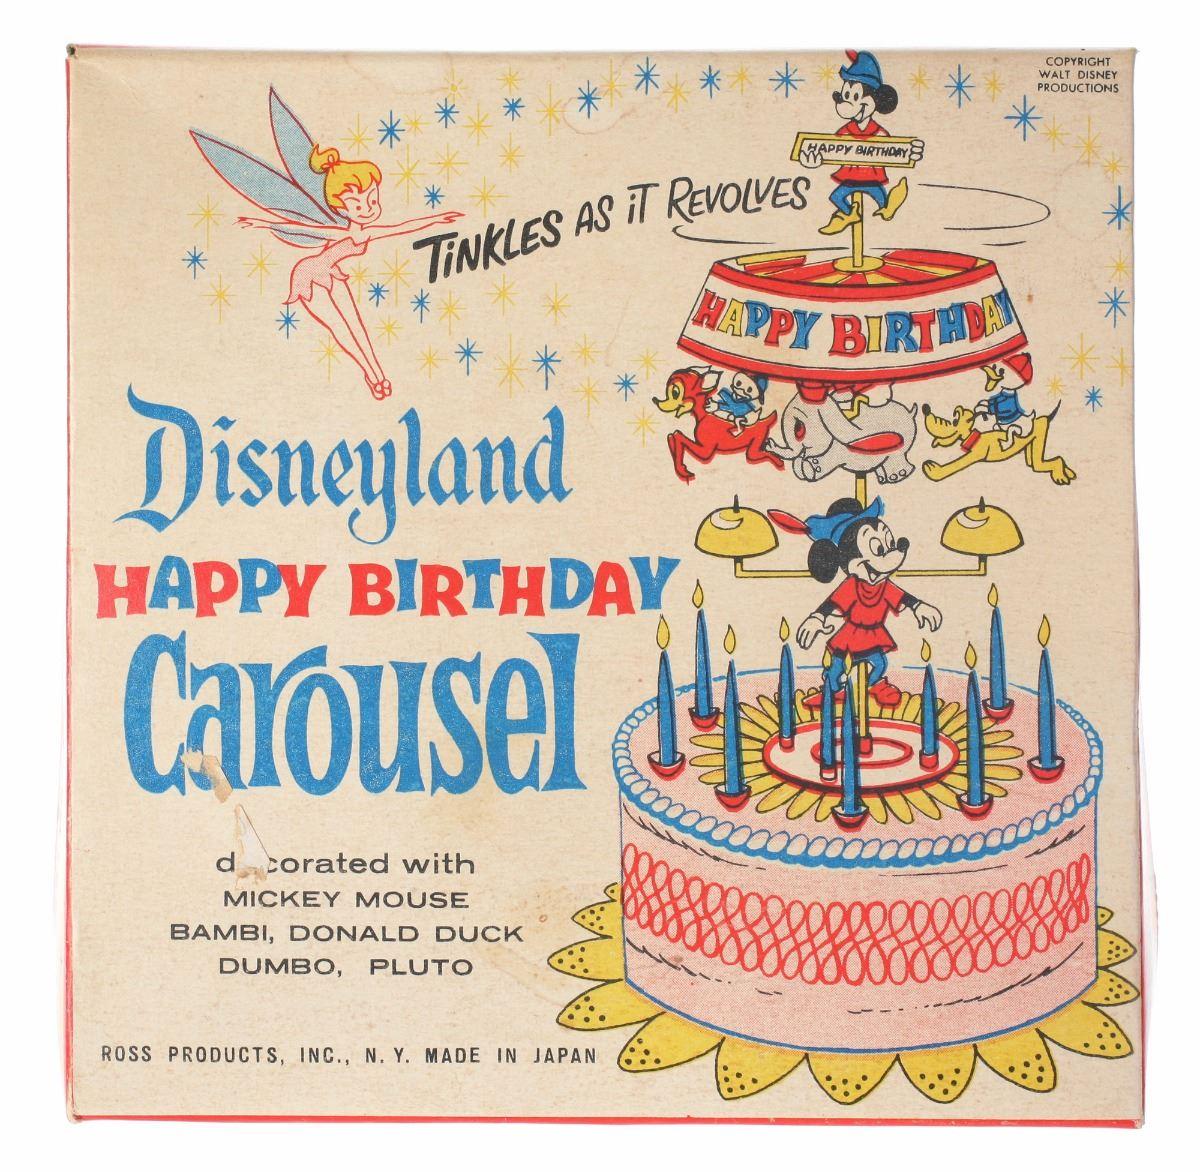 Image 1 Disneyland Happy Birthday Carousel Cake Topper